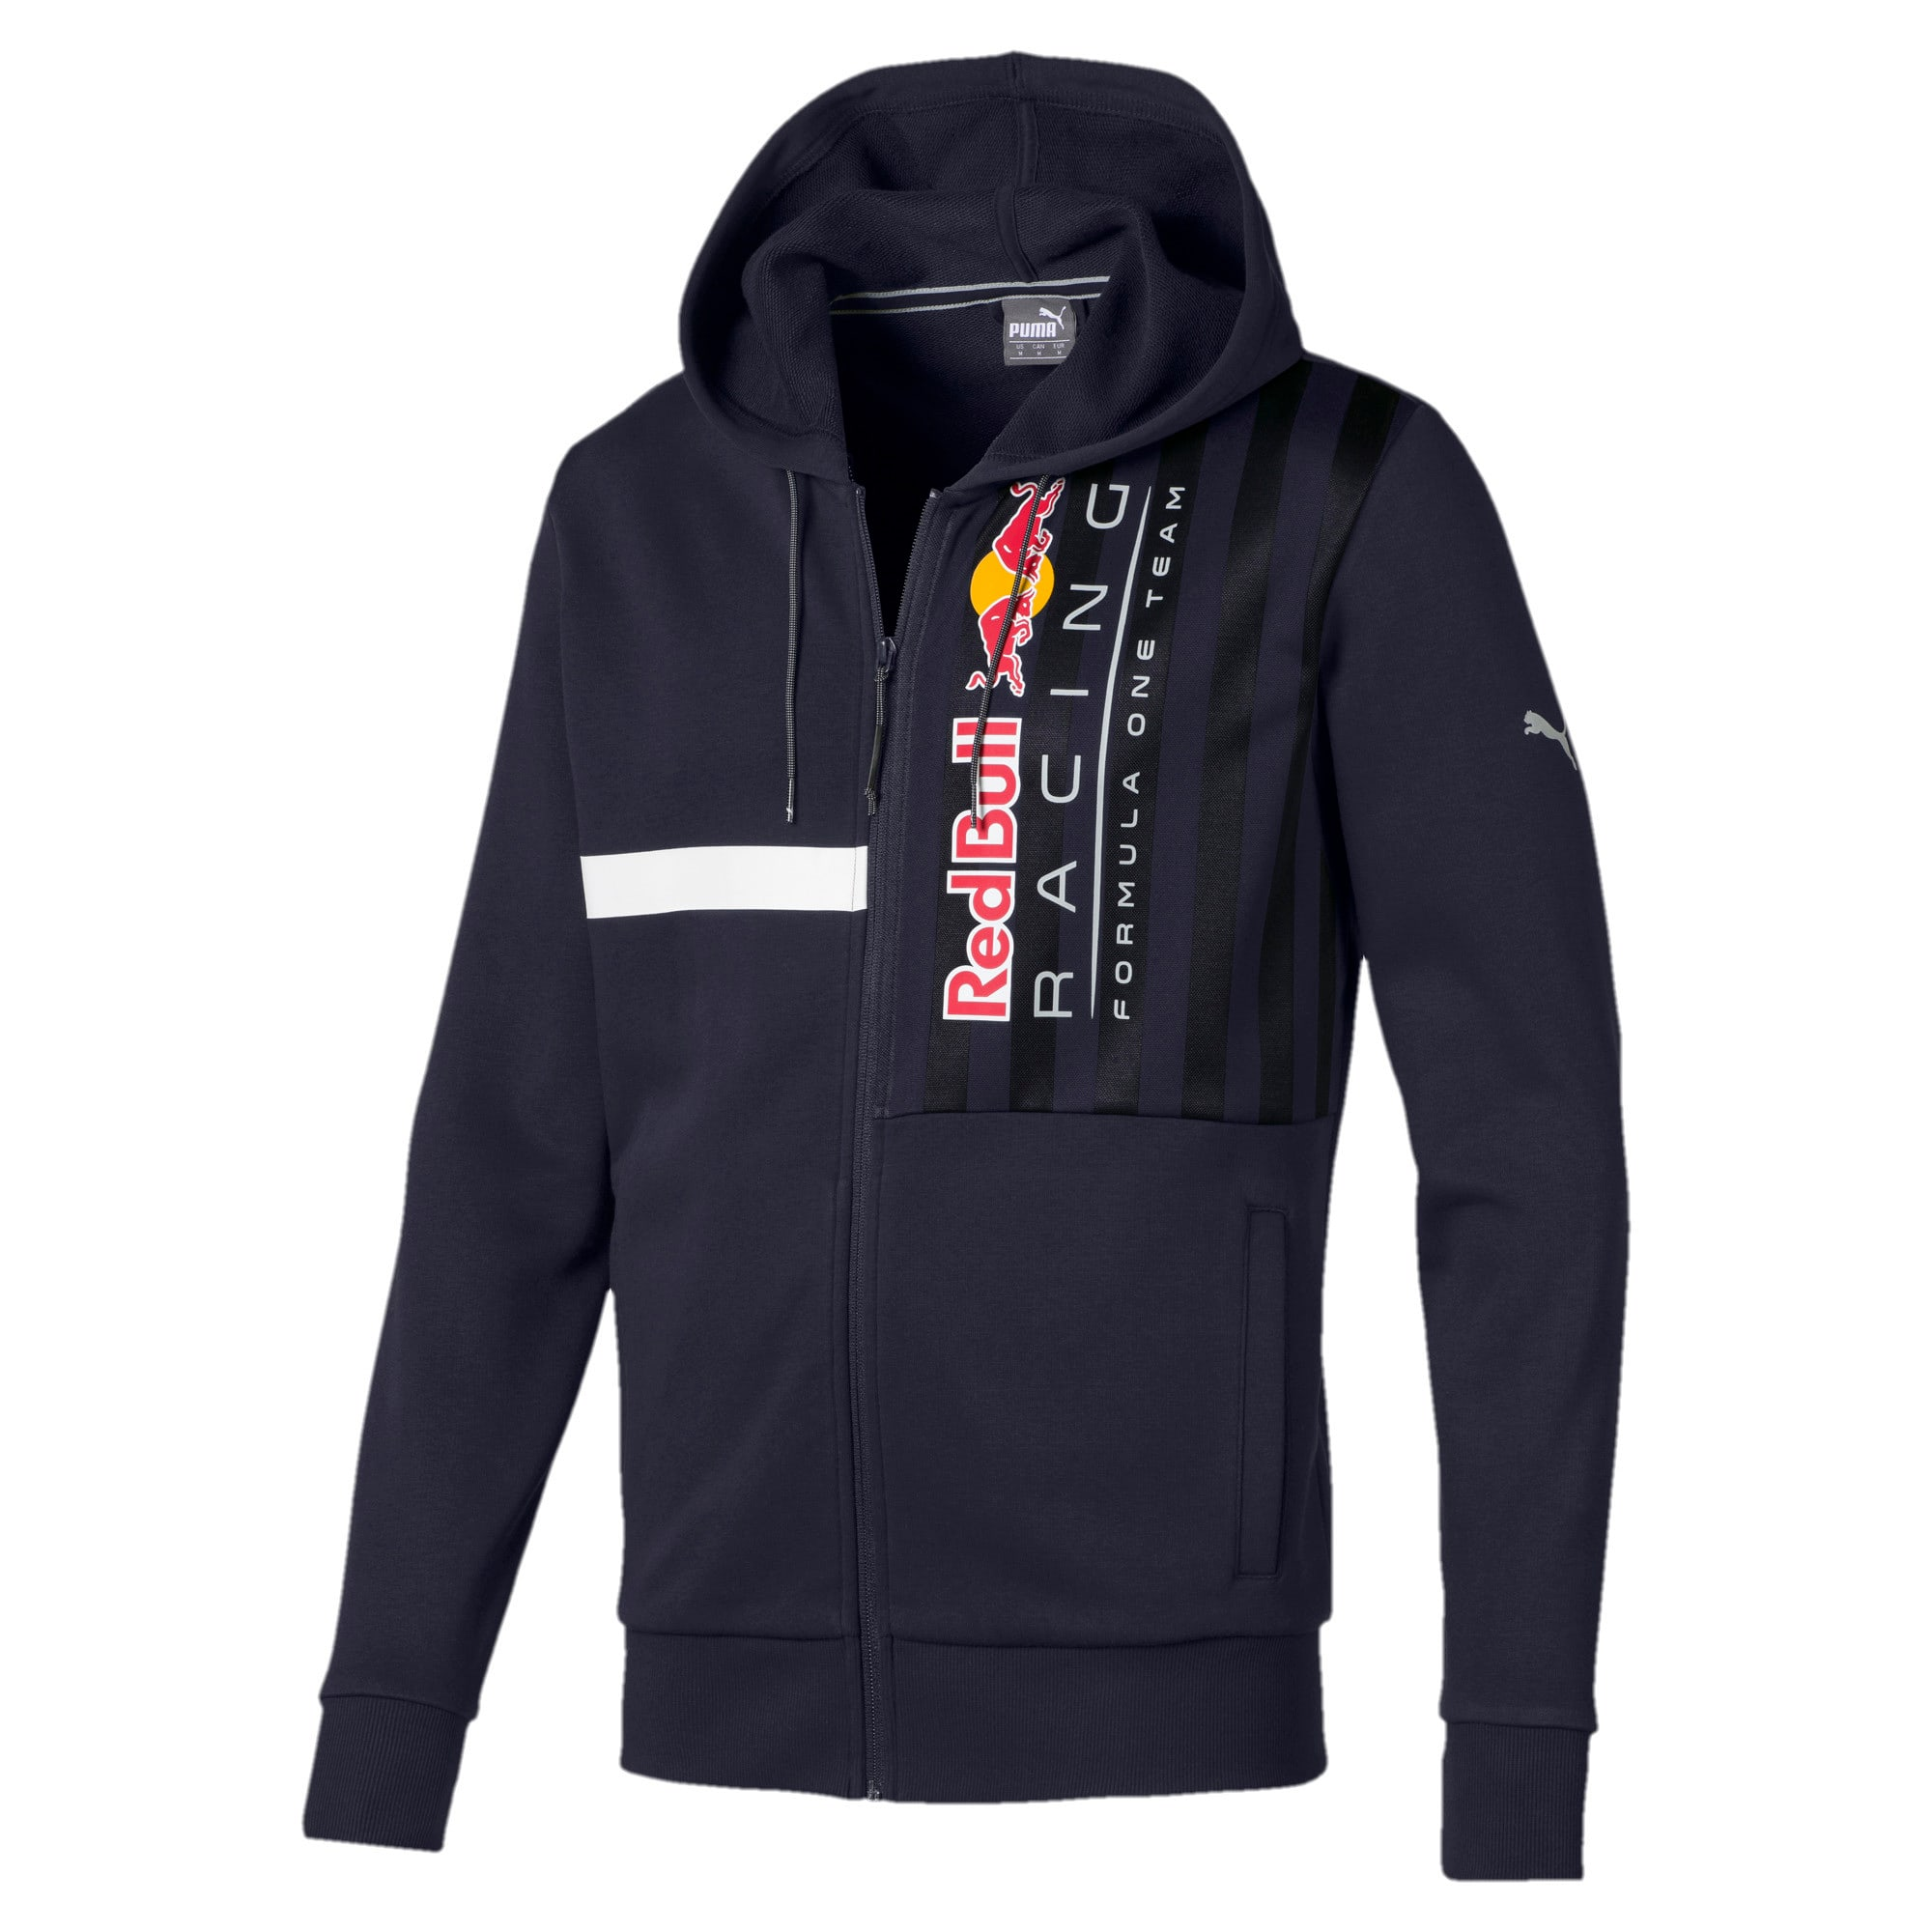 Thumbnail 4 of Red Bull Racing Hooded Men's Sweat Jacket, NIGHT SKY, medium